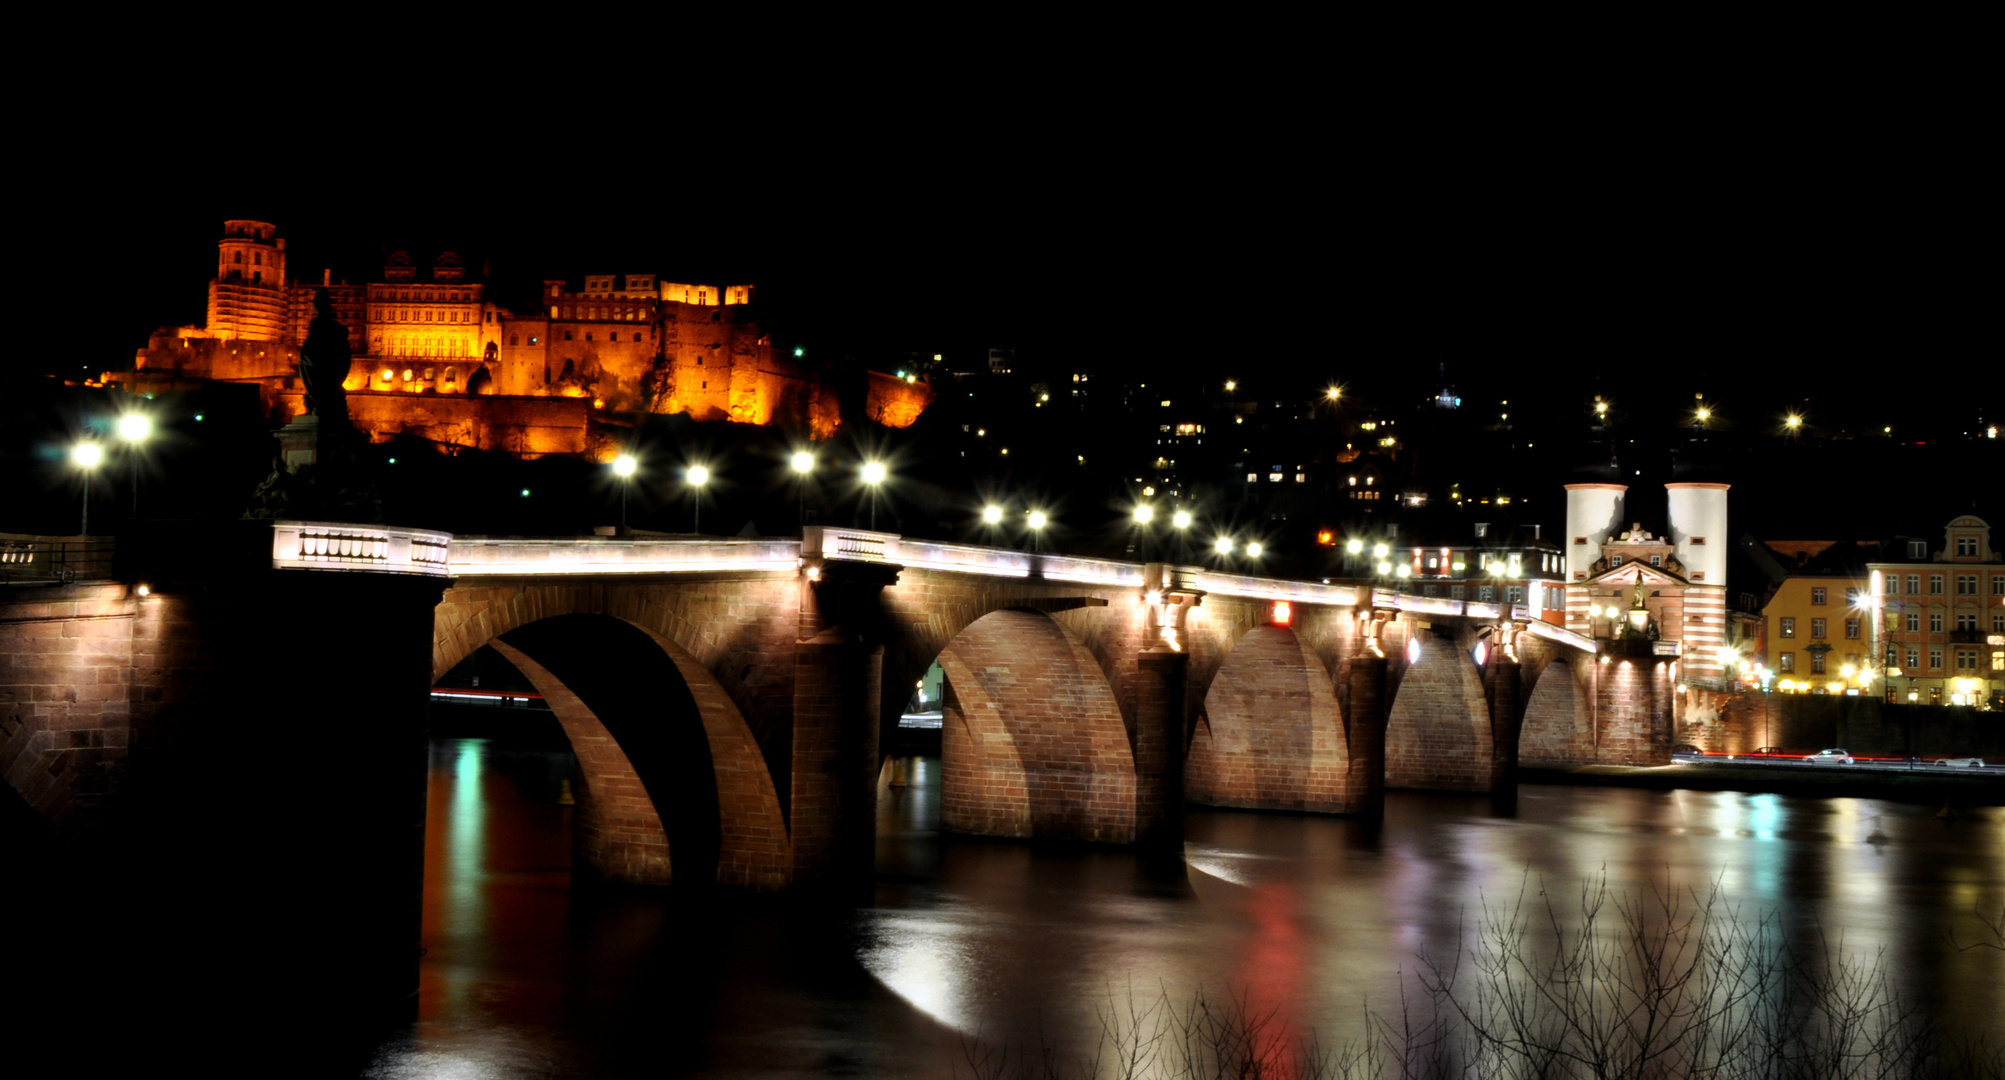 Heidelberg's most famous bridge